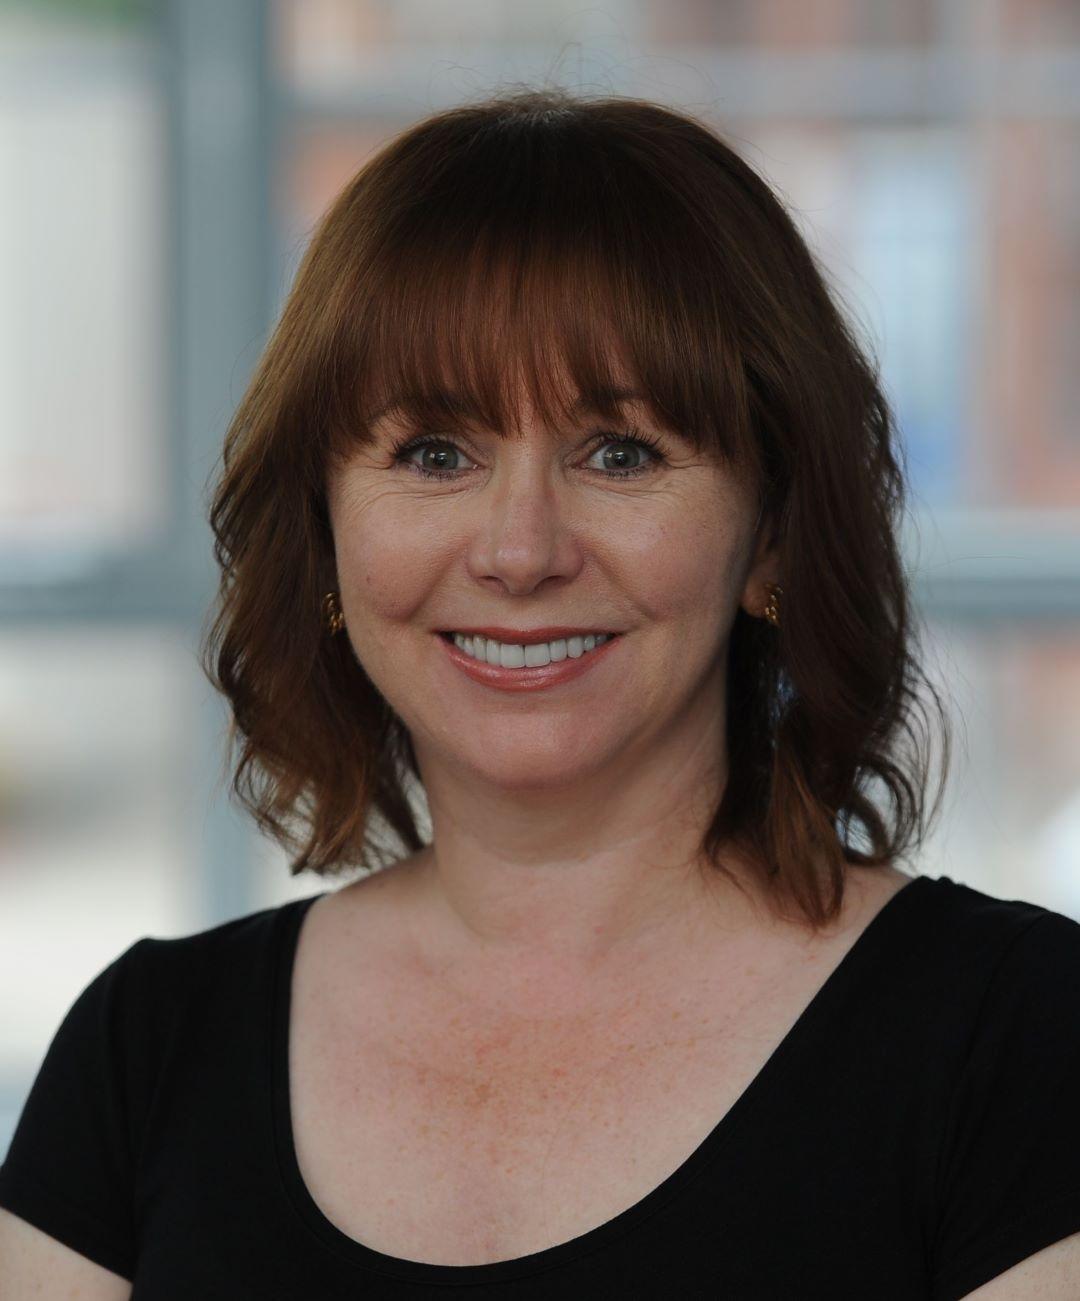 JSTA Teachers Julie Sianne Theatre Arts